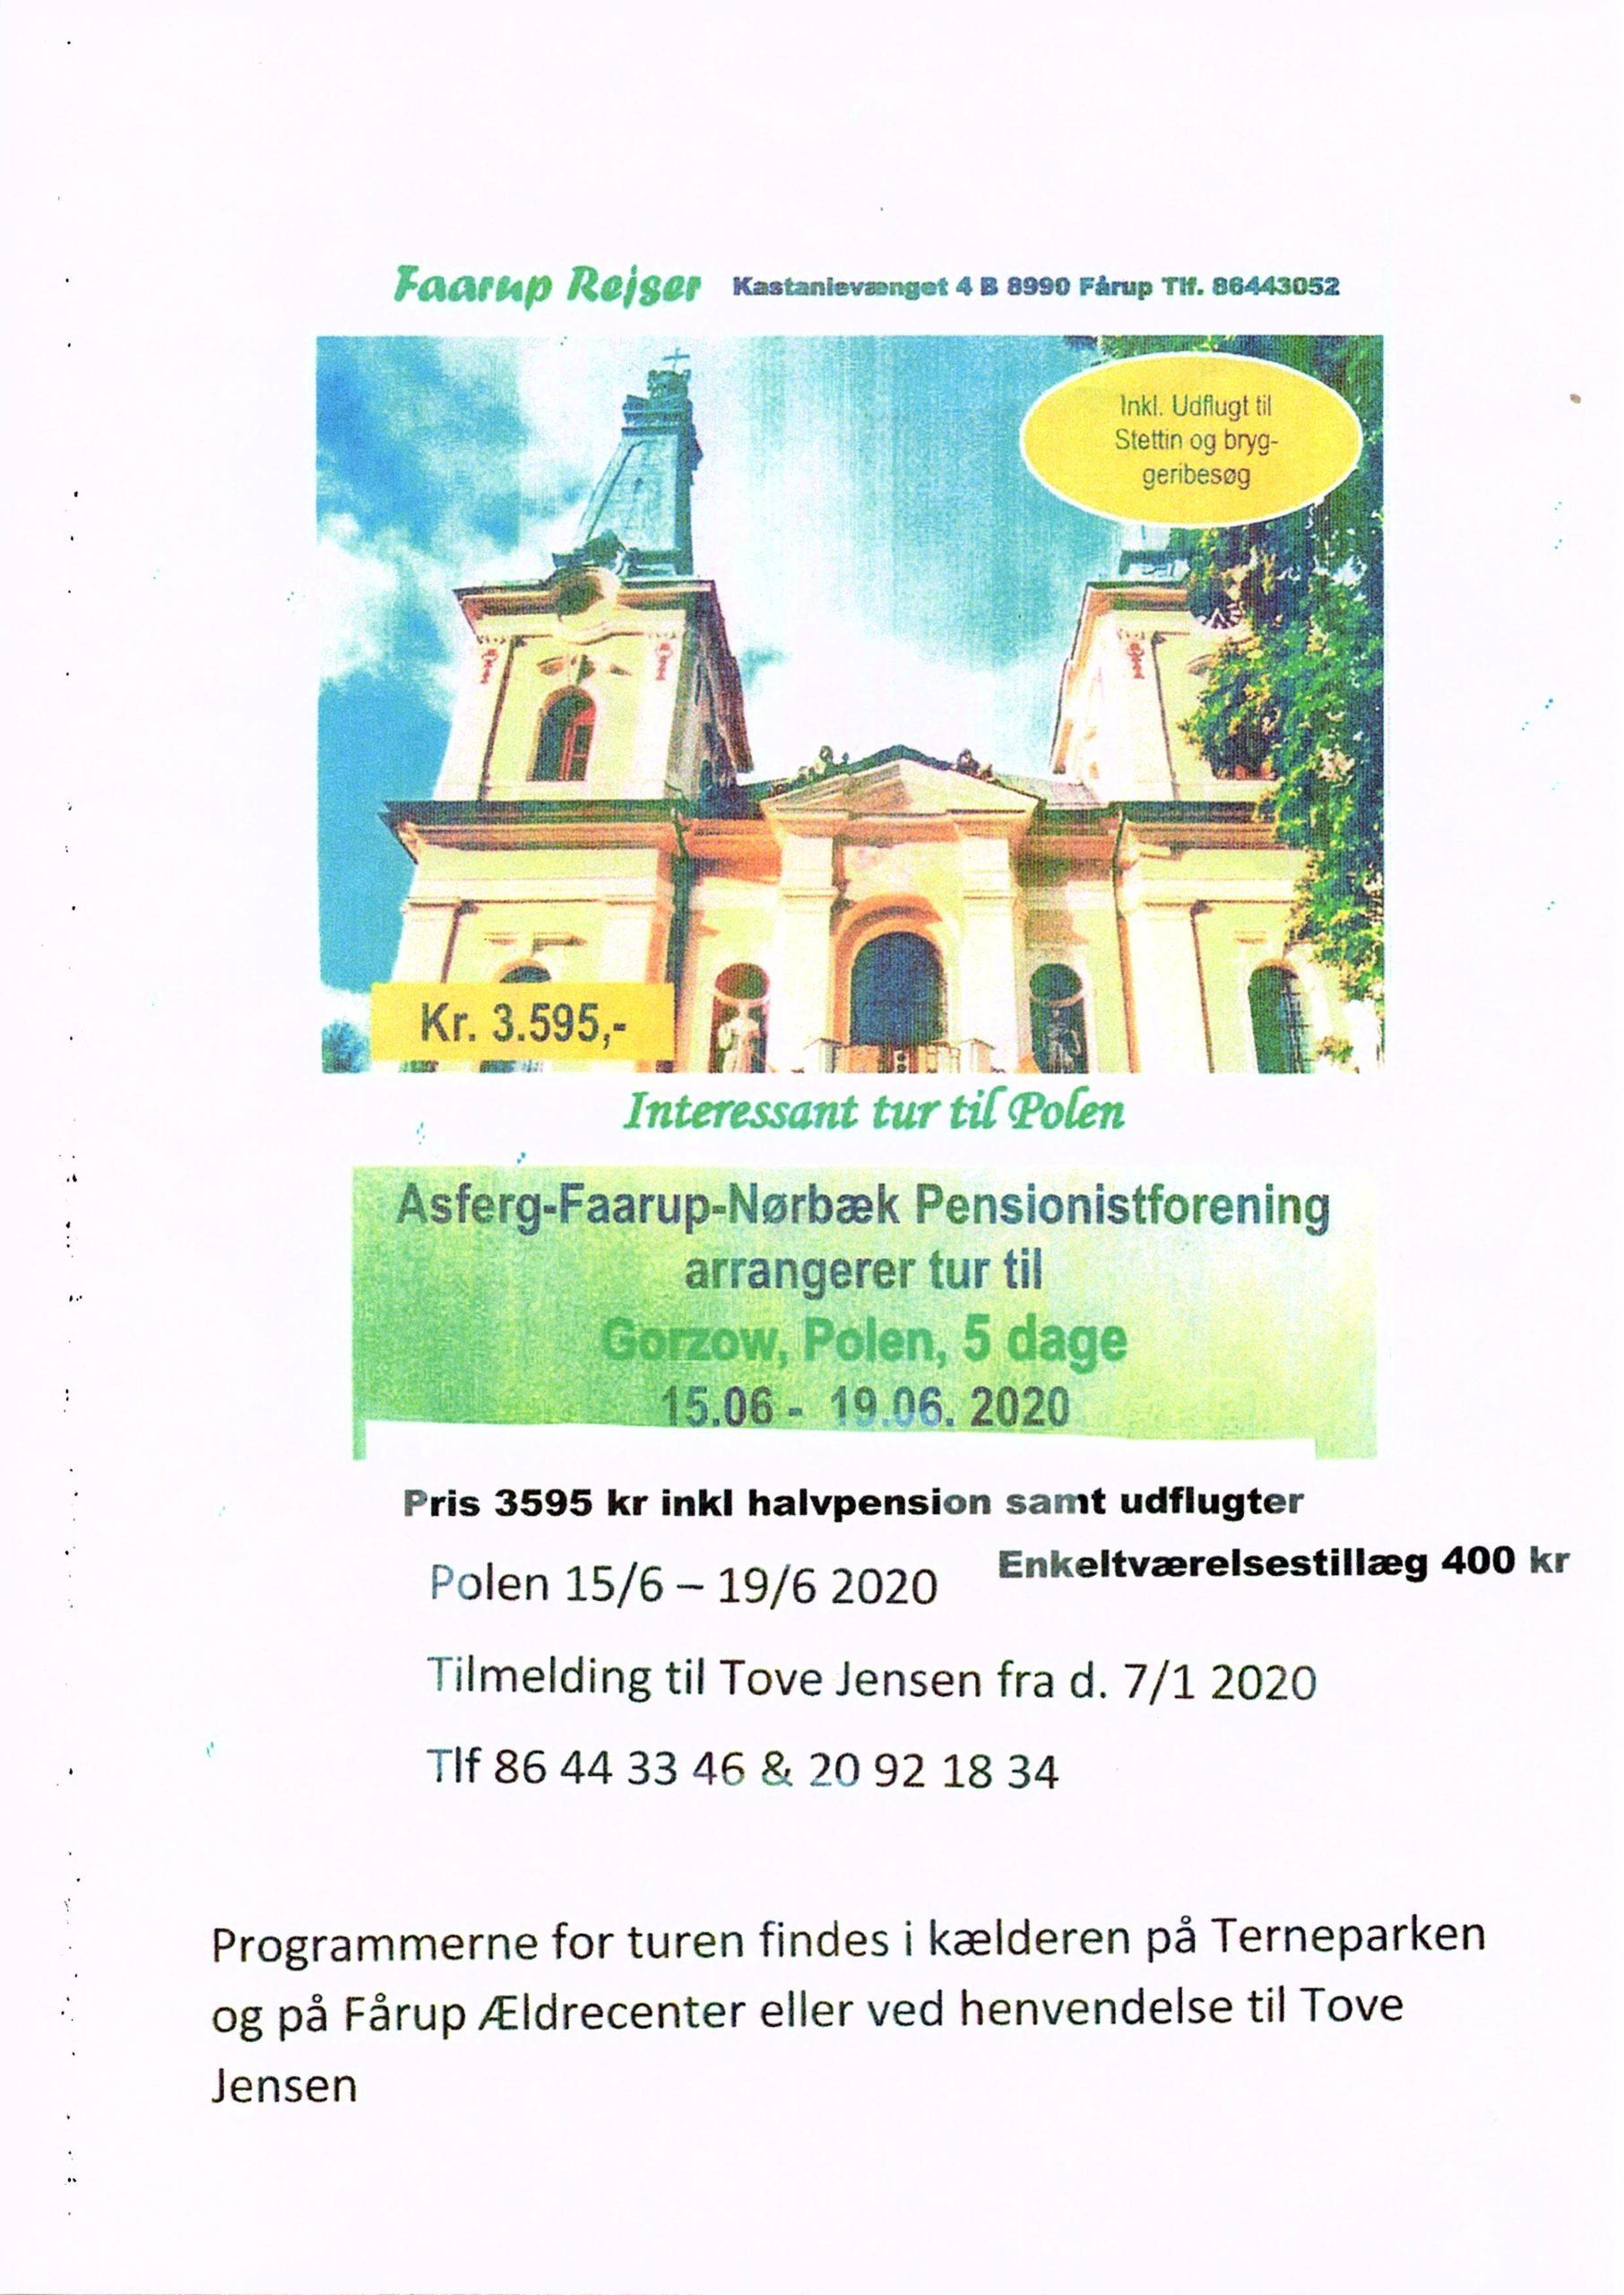 Aflyst .Interessant tur til Gorzow, Polen 5 dage